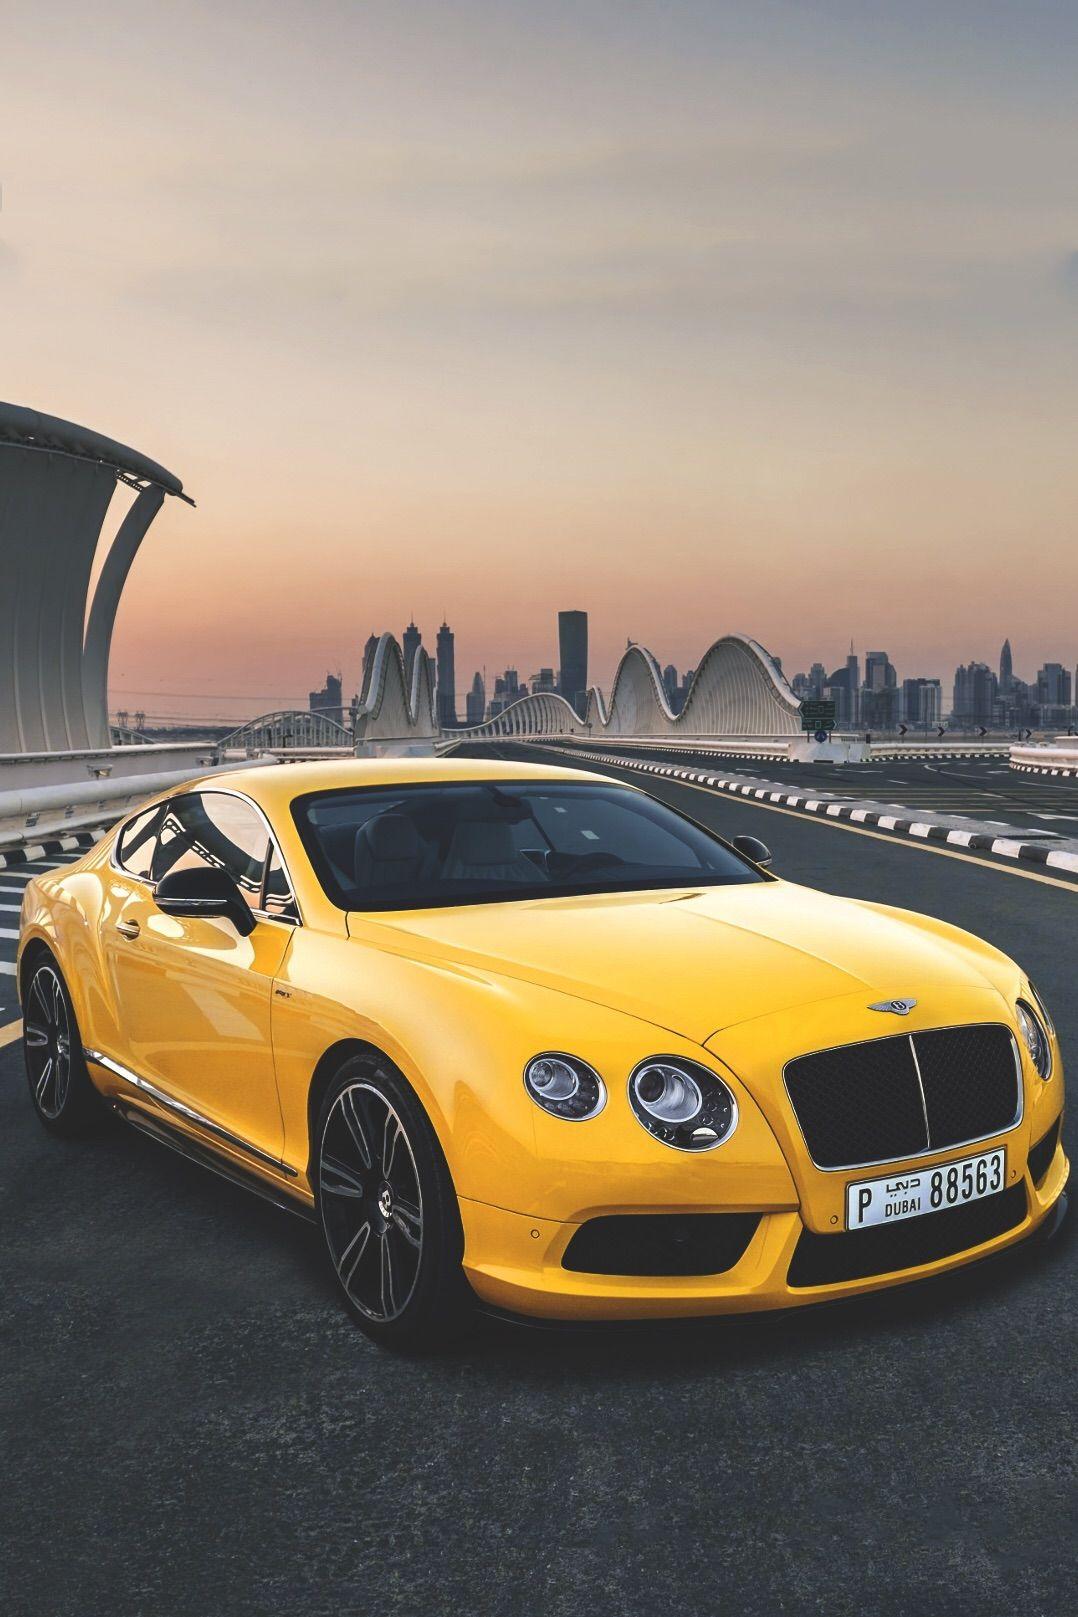 Bentley Fc Kerbeck Bentley Pinterest Cars Luxury Cars And